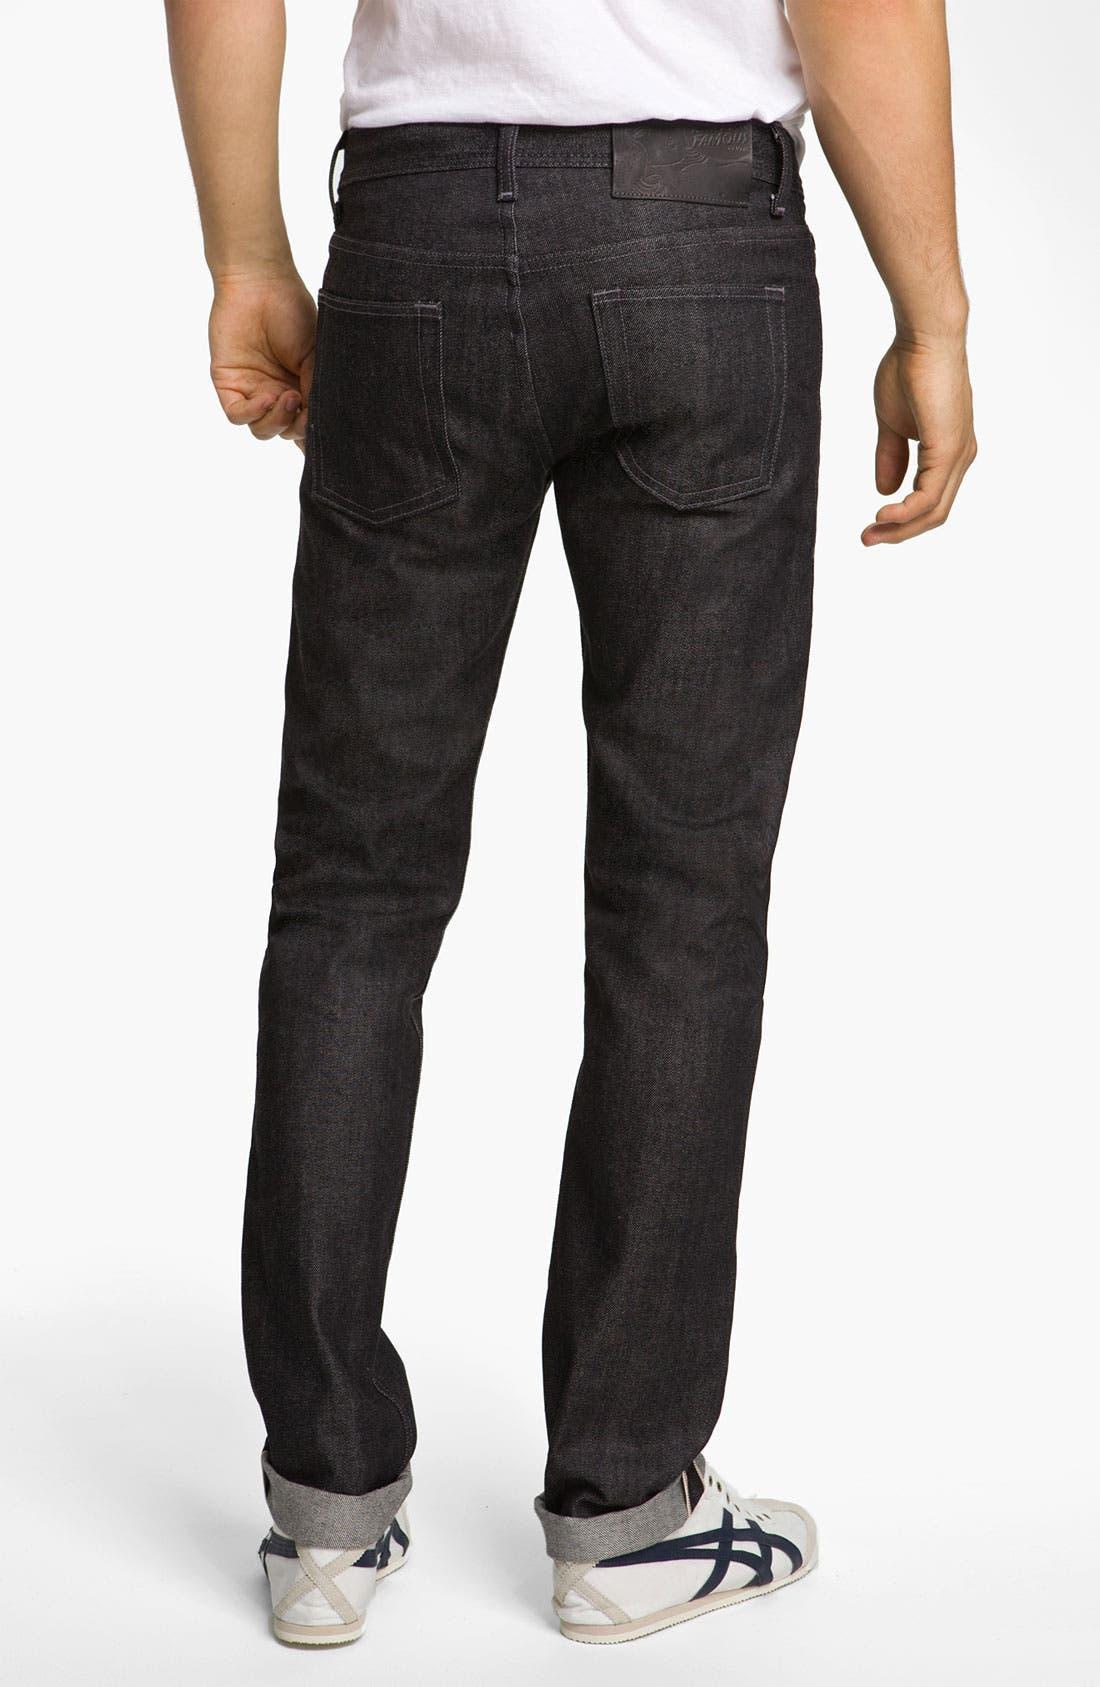 Alternate Image 1 Selected - Naked & Famous Denim 'Weird Guy' Slim Fit Selvedge Jeans (Black)